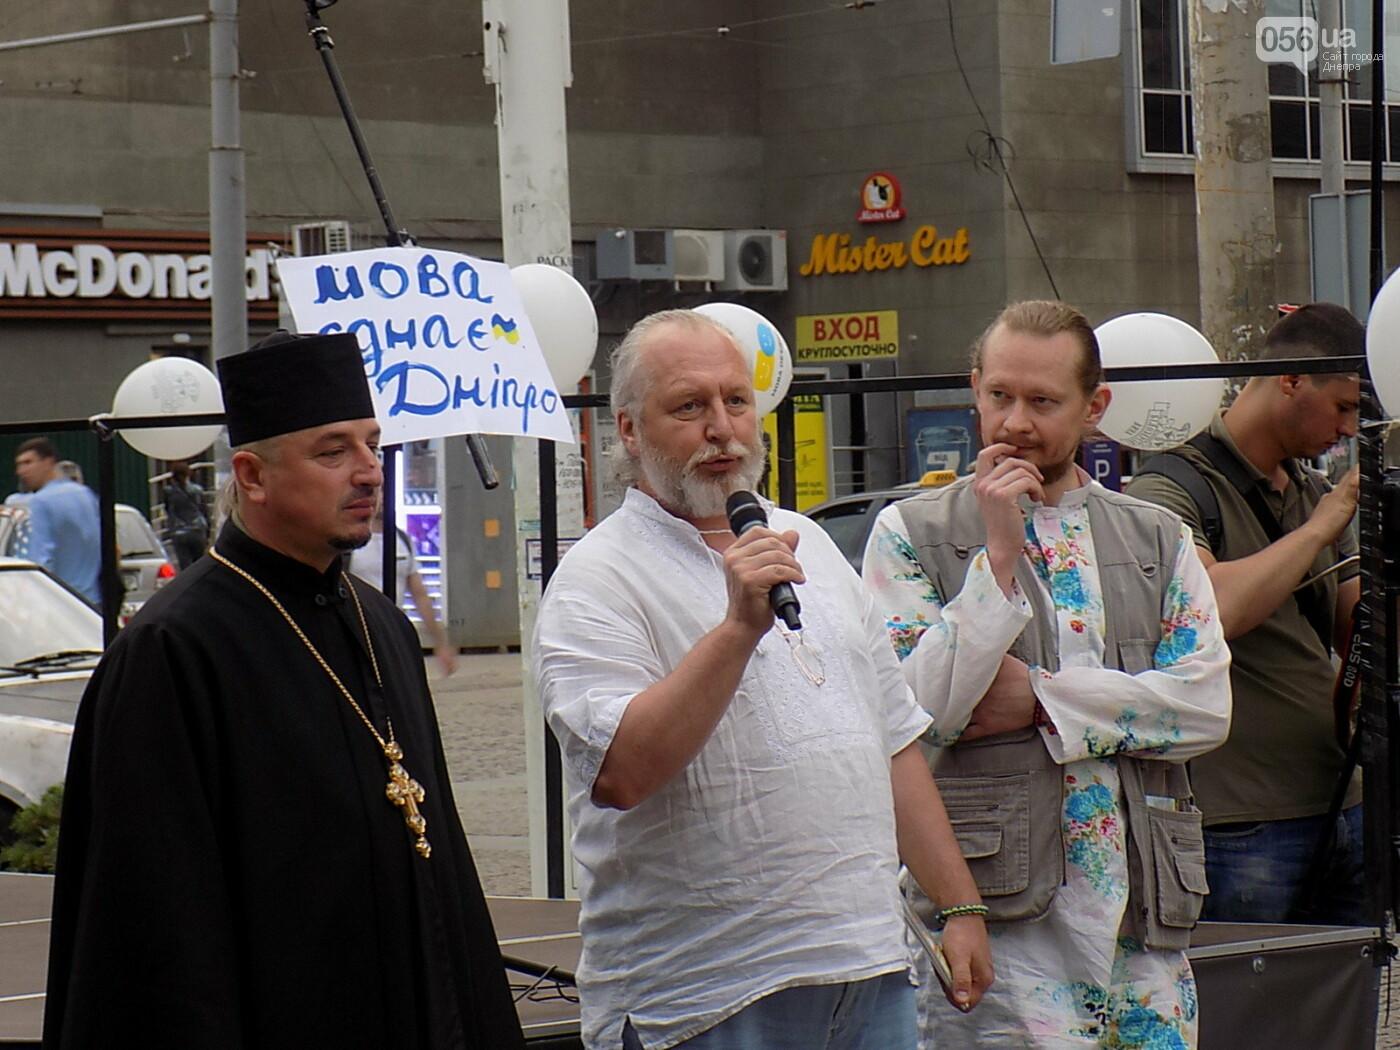 """Мова єднає Дніпро"": в центре города прошла символическая акция с концертом и подарками, - ФОТО, фото-16"